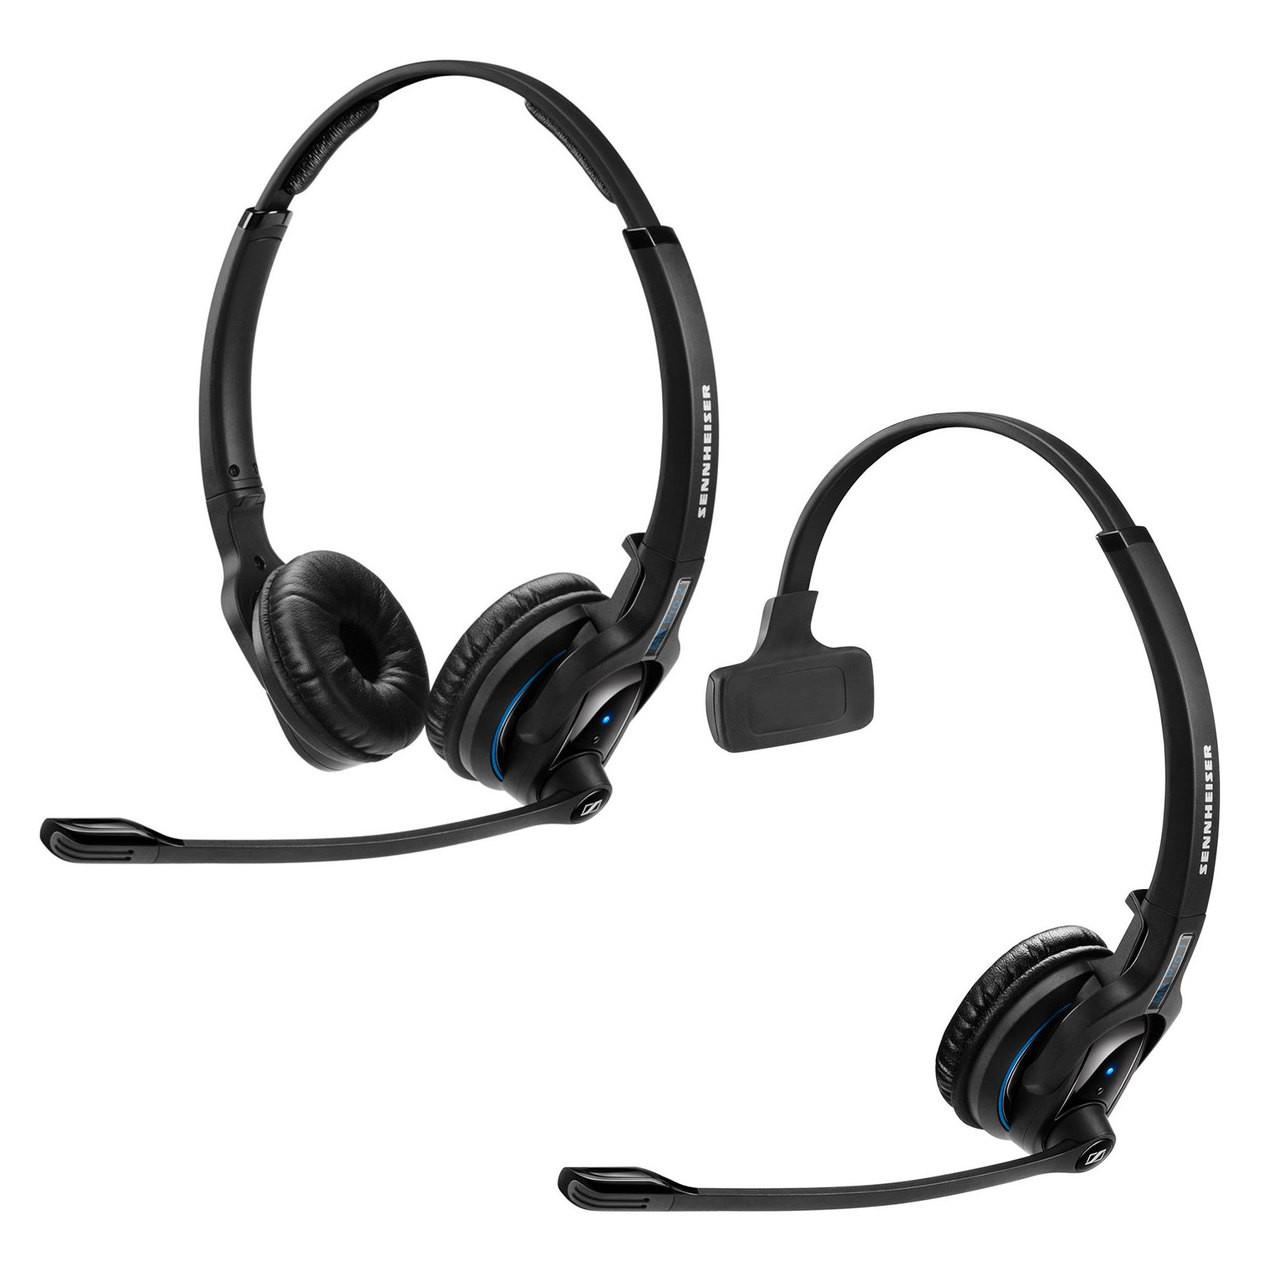 6f3f838f2d4 Sennheiser MB Pro 1/2 Premium Bluetooth Headsets | Free Shipping on ...